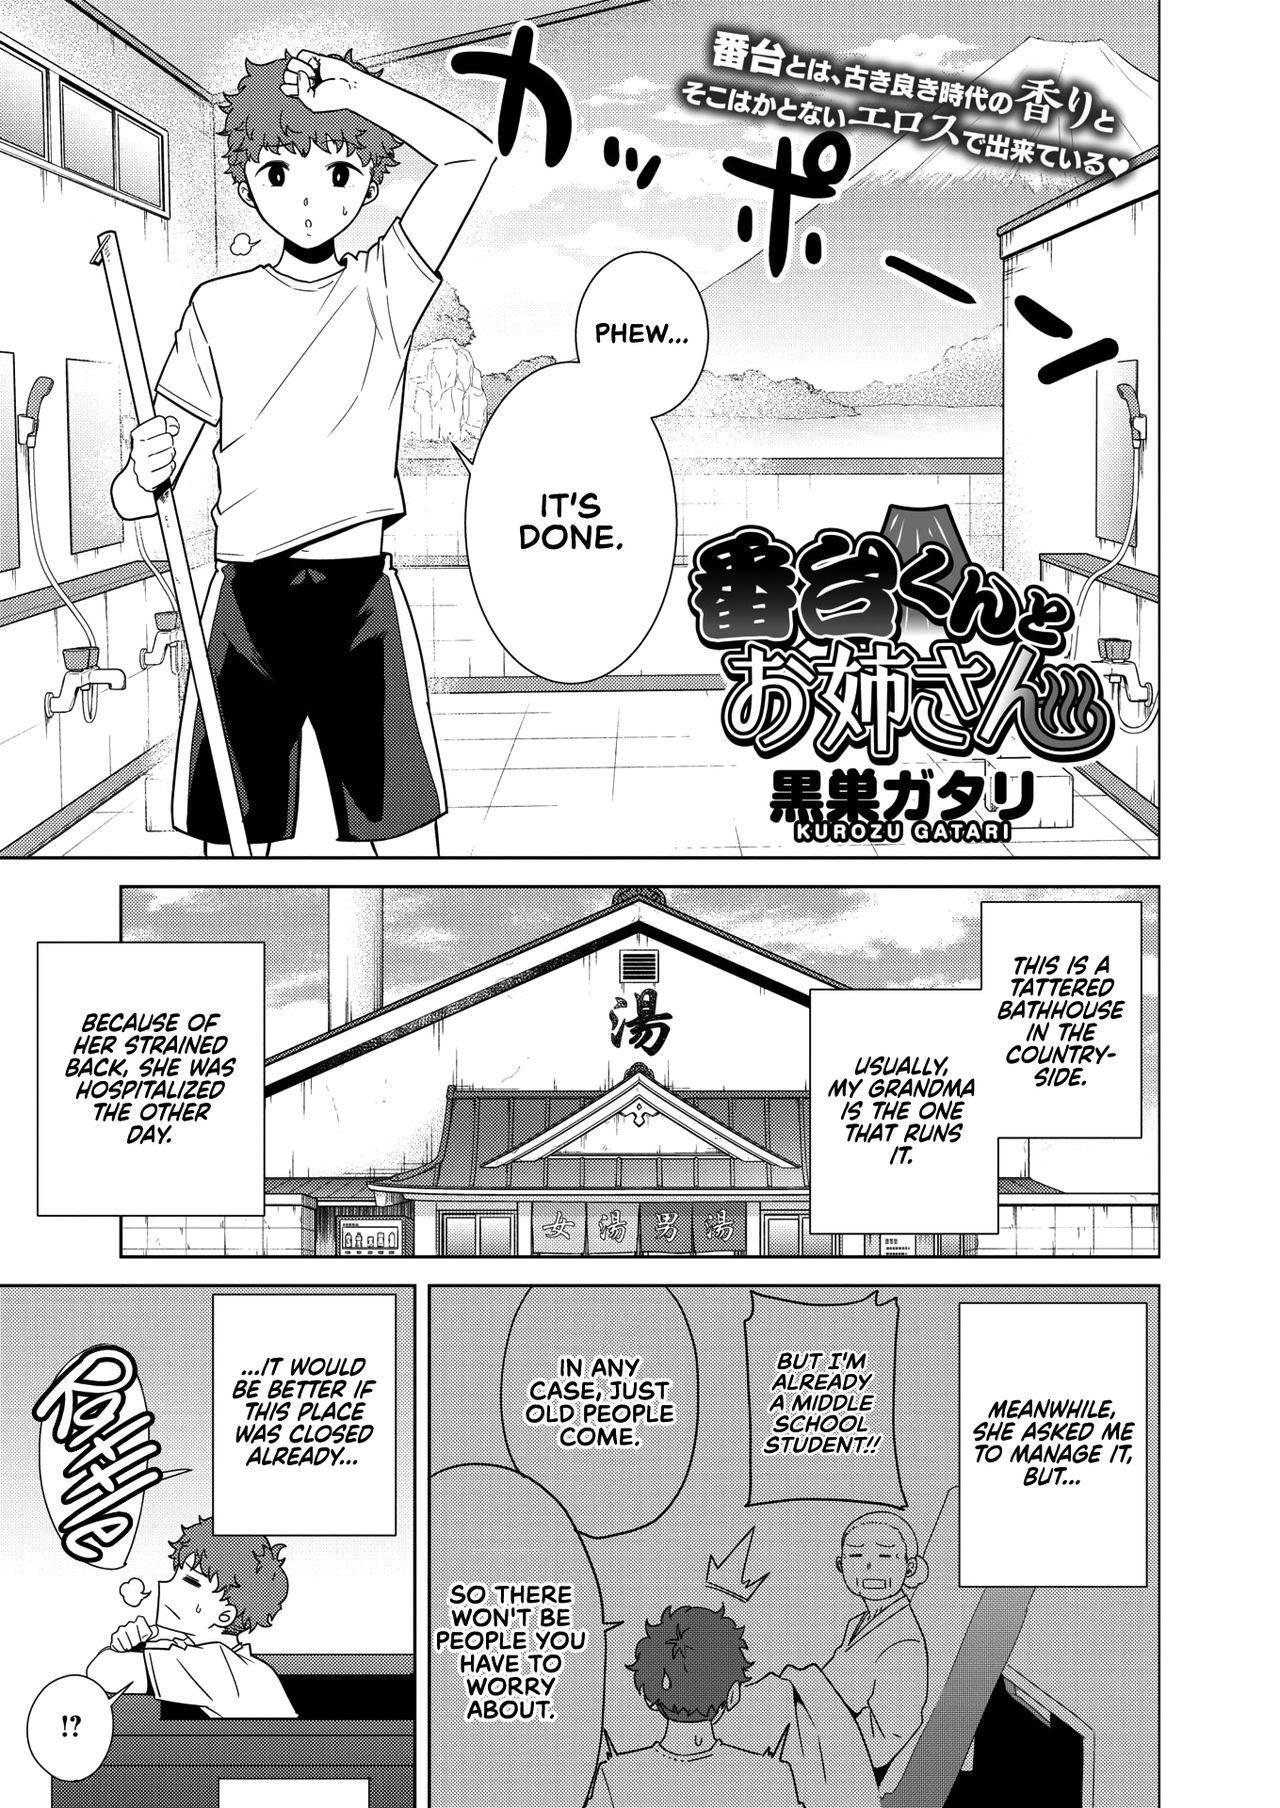 [Kurosu Gatari] Bandai-kun to Onee-san | Bath Attendant-kun and Onee-san (COMIC HOTMILK 2020-08) [English] [Coffedrug+RedLantern] [Digital] 0